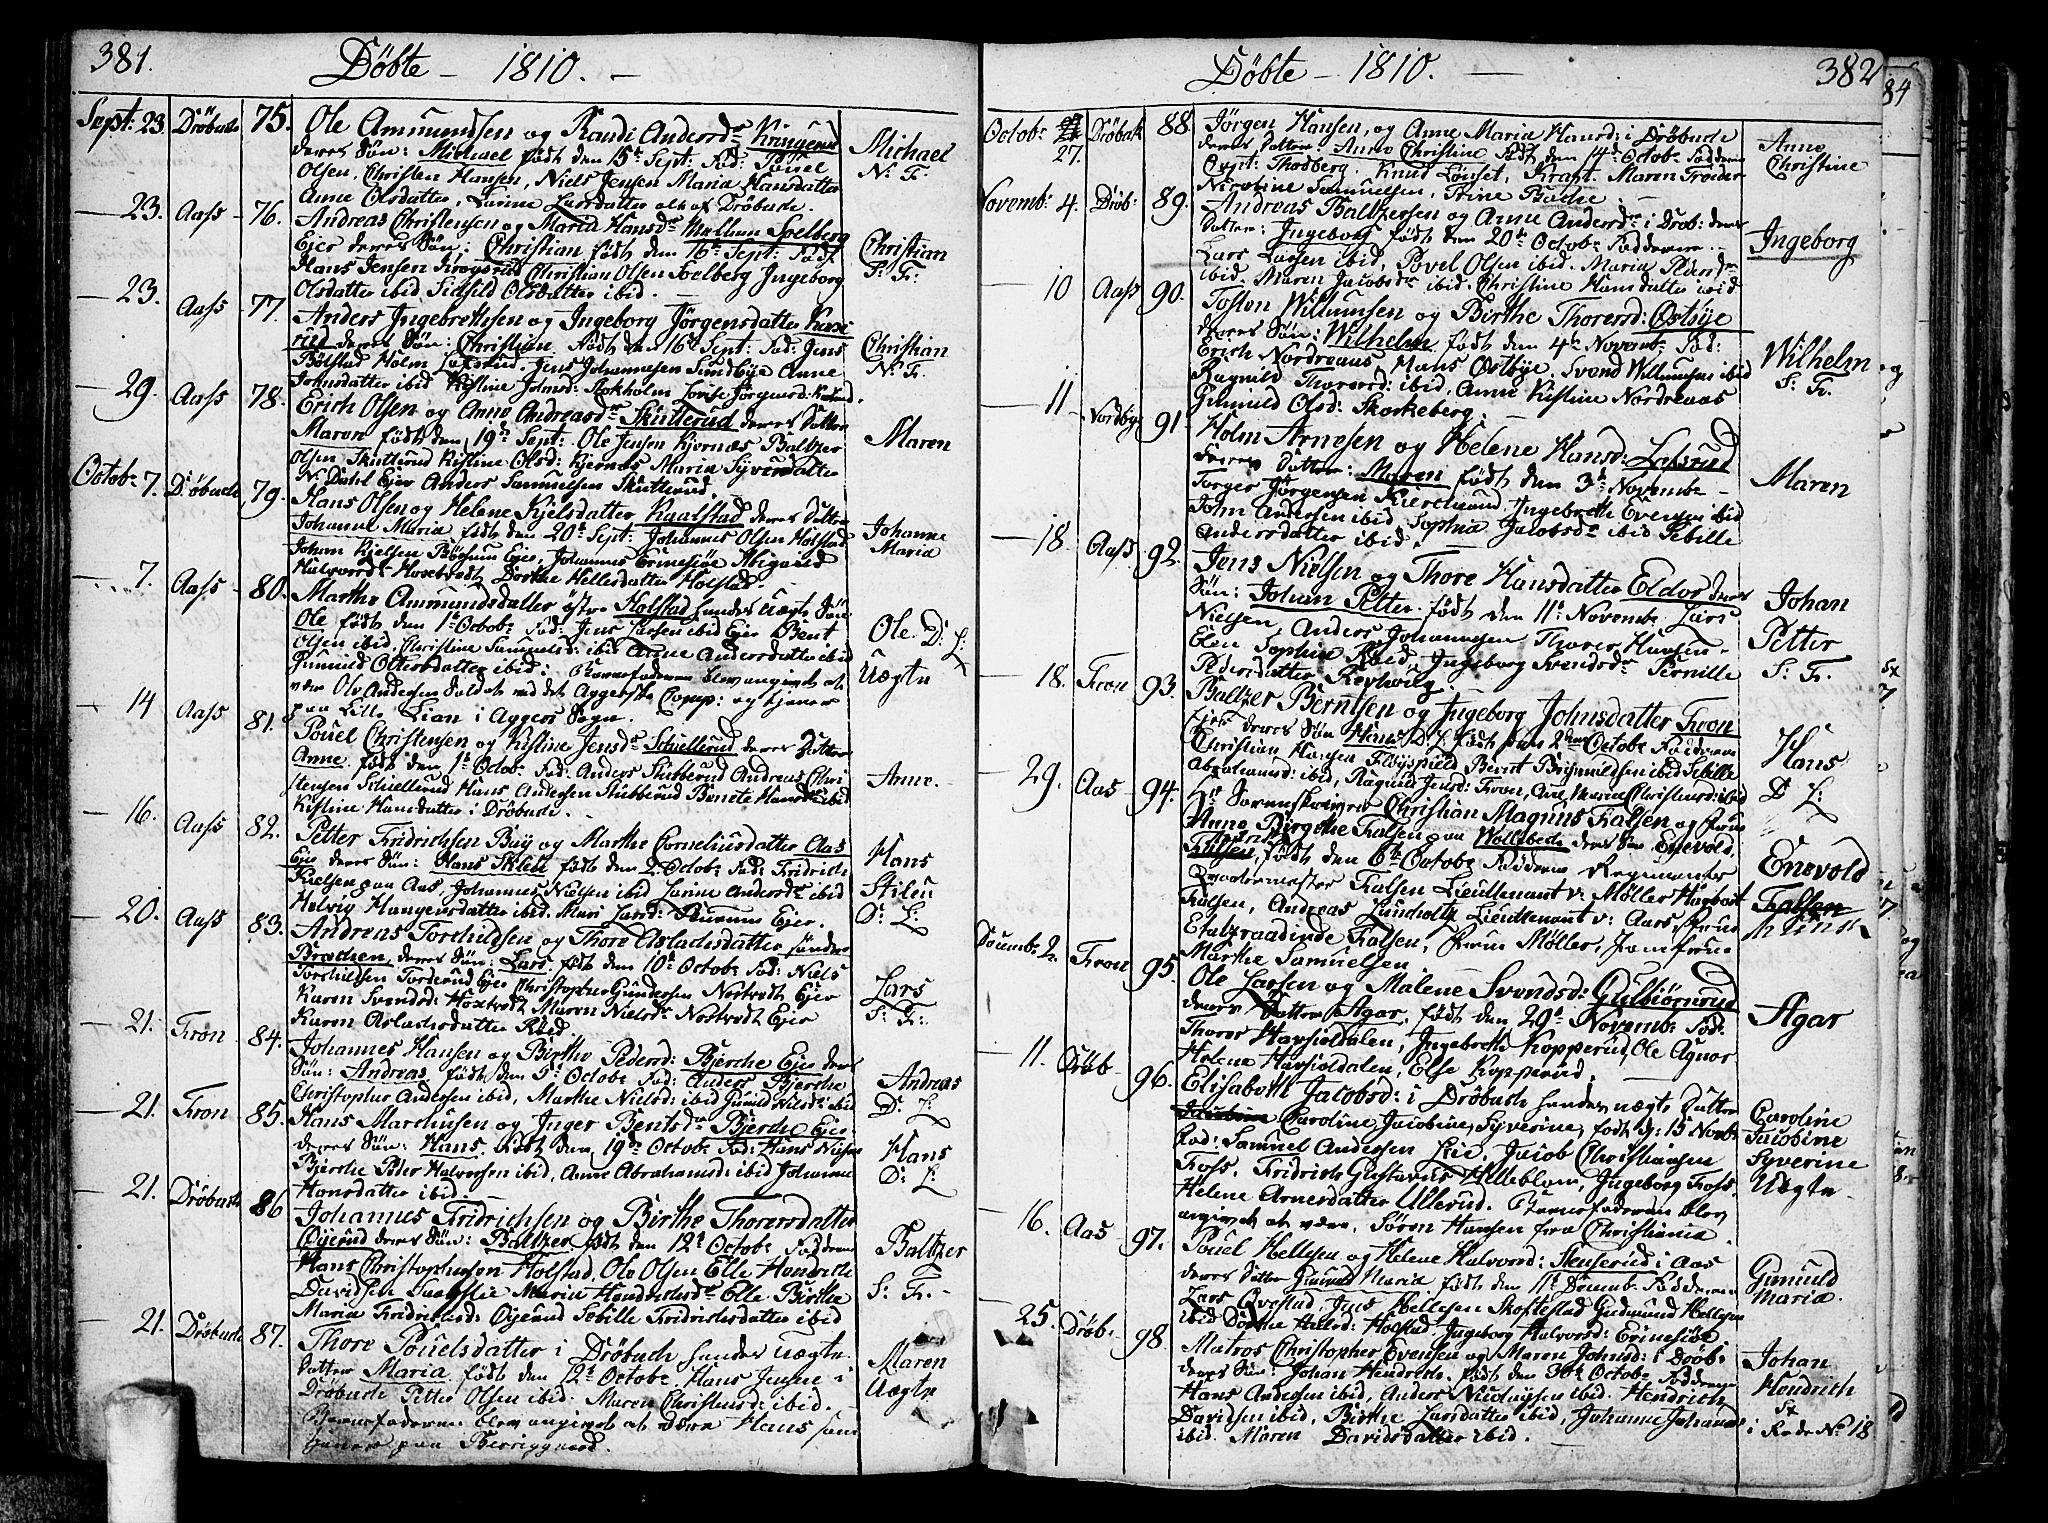 SAO, Ås prestekontor Kirkebøker, F/Fa/L0002: Ministerialbok nr. I 2, 1778-1813, s. 381-382